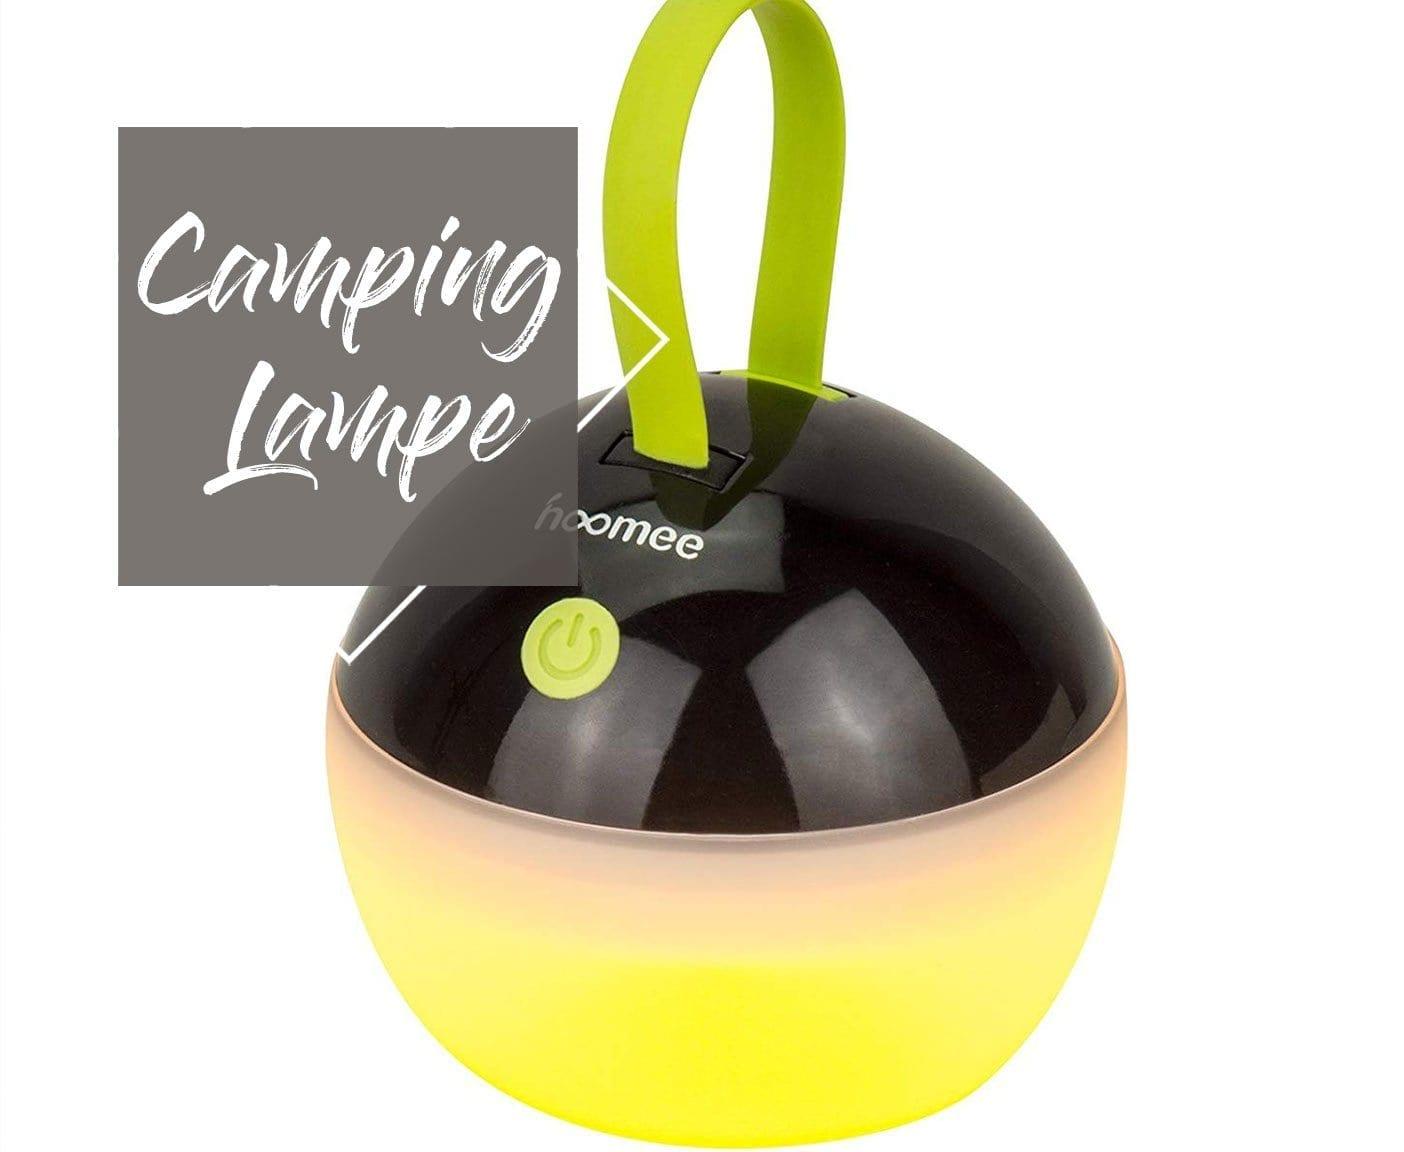 camping-licht-beleuchtung-12v-solar-batterie-test-ohne-Strom-solar-lampe